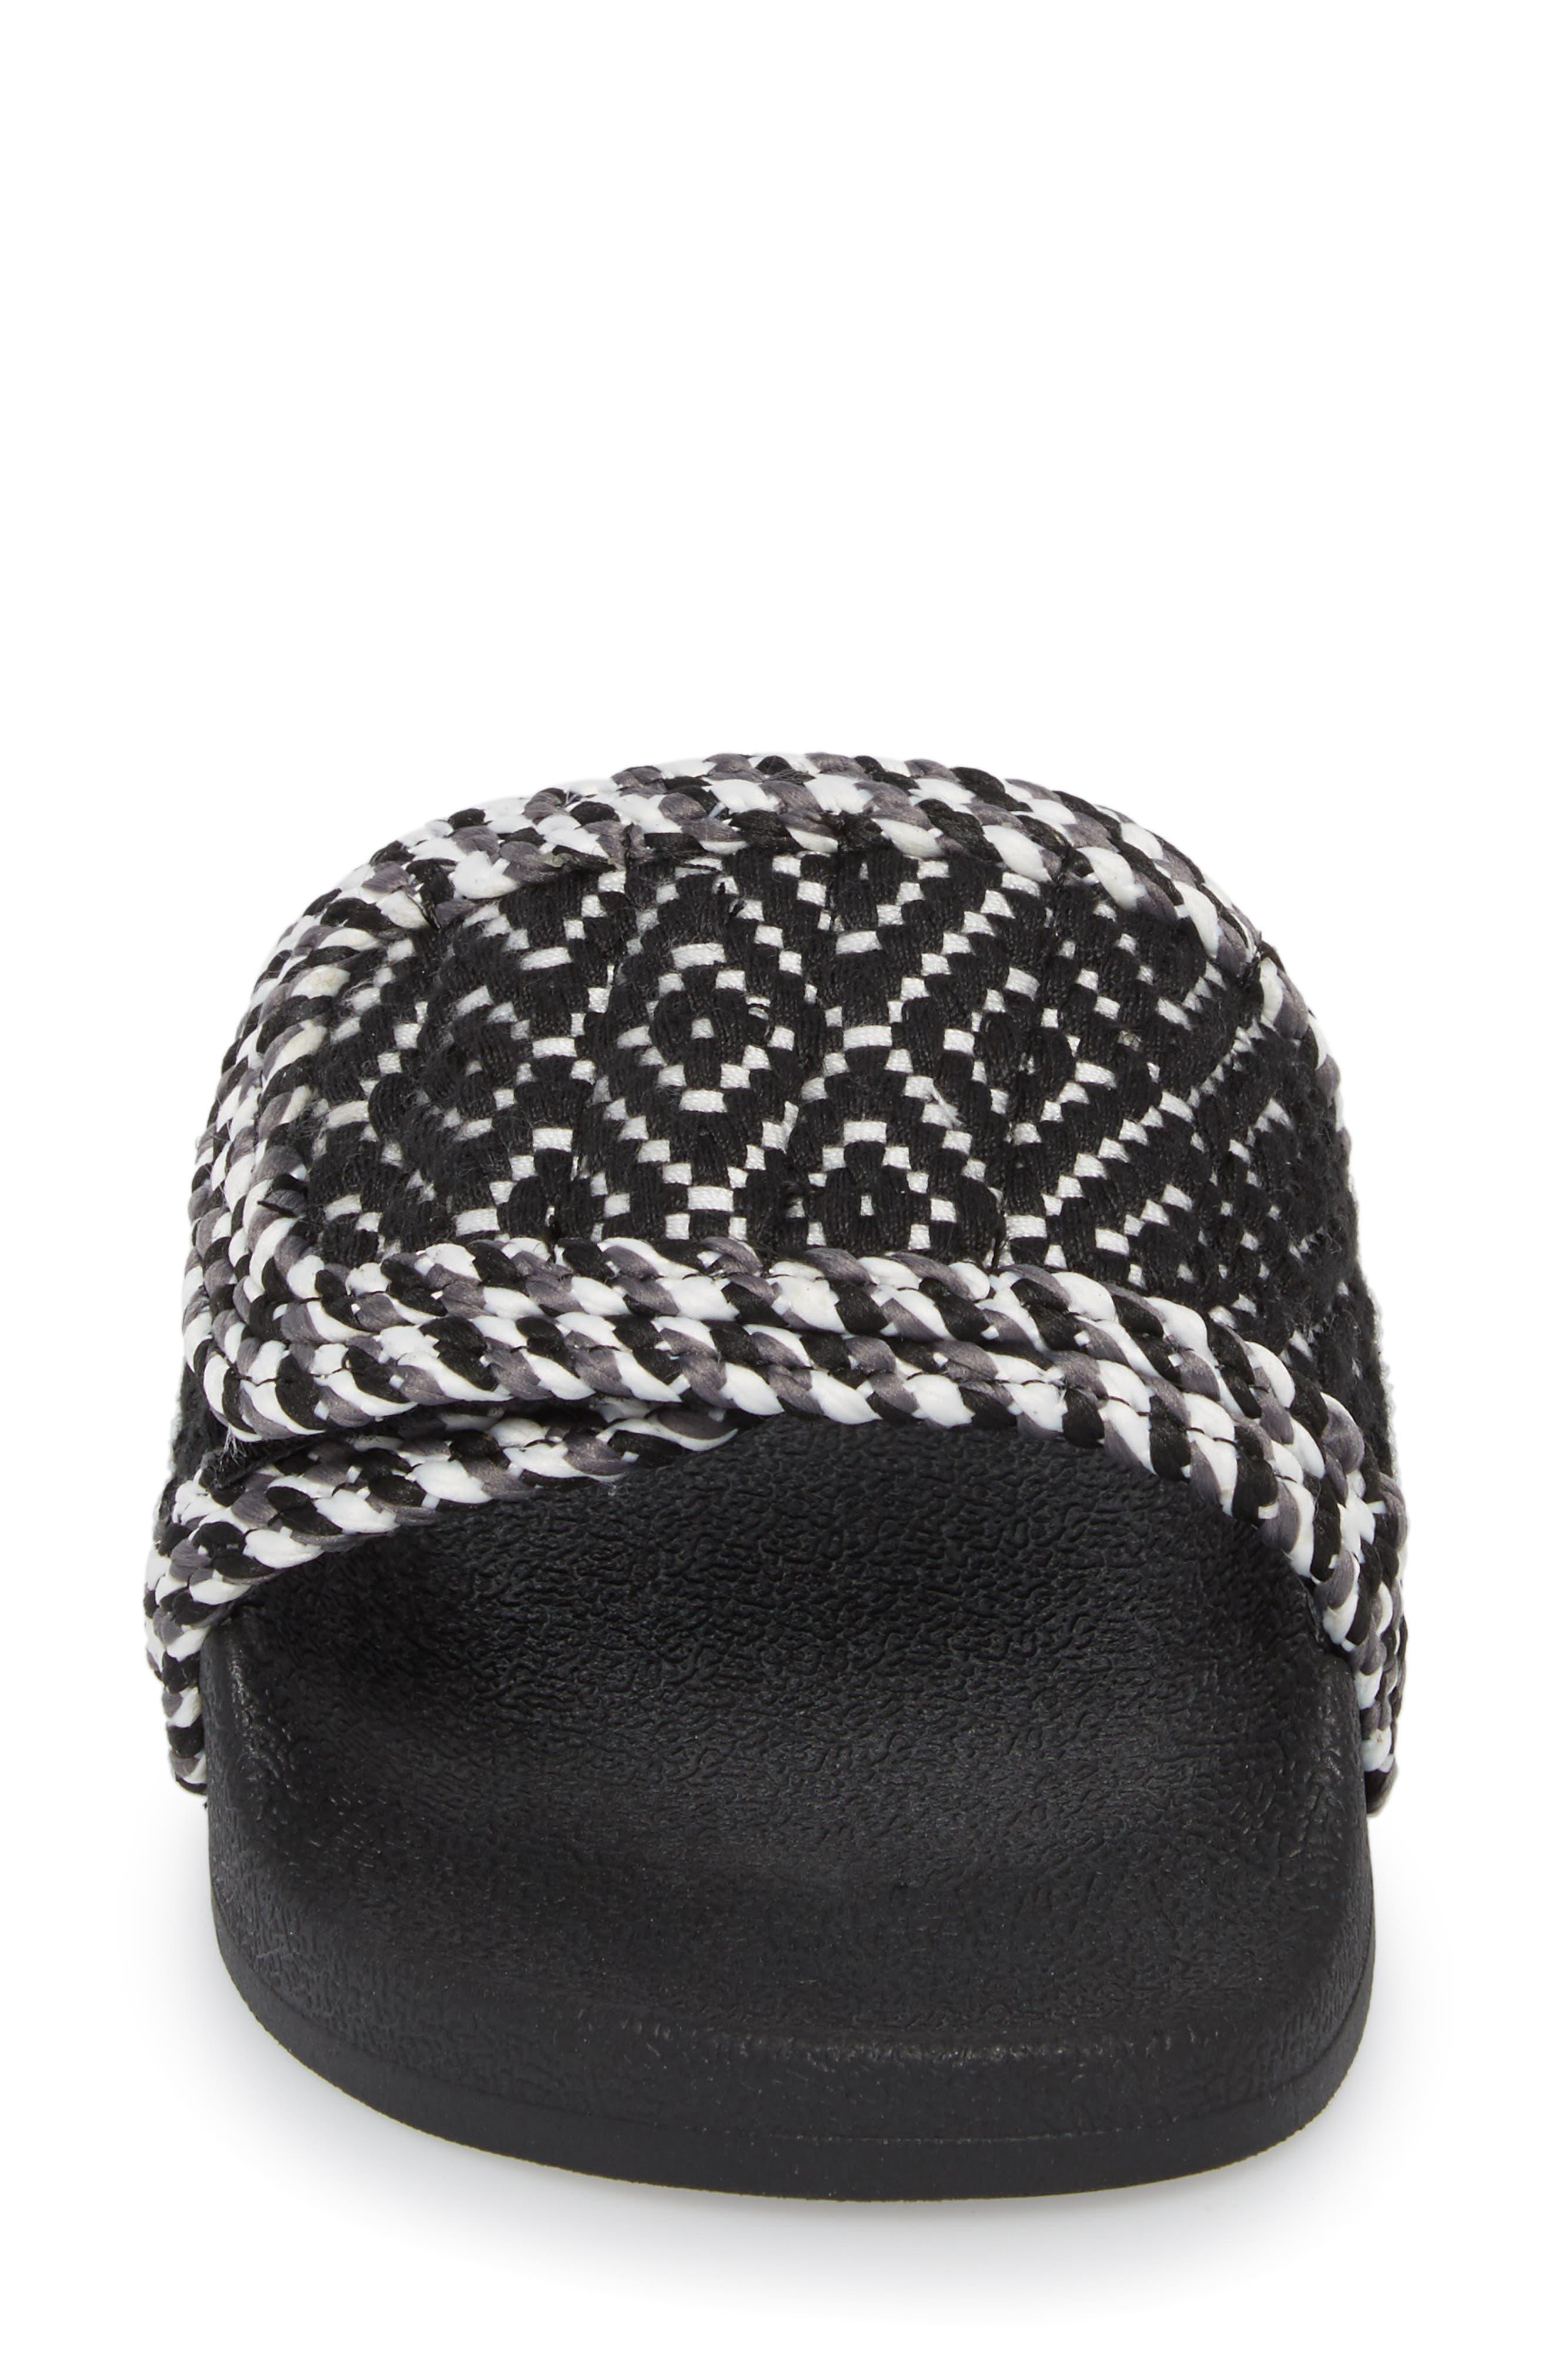 Tressa Woven Slide Sandal,                             Alternate thumbnail 4, color,                             Black/ White Woven Fabric